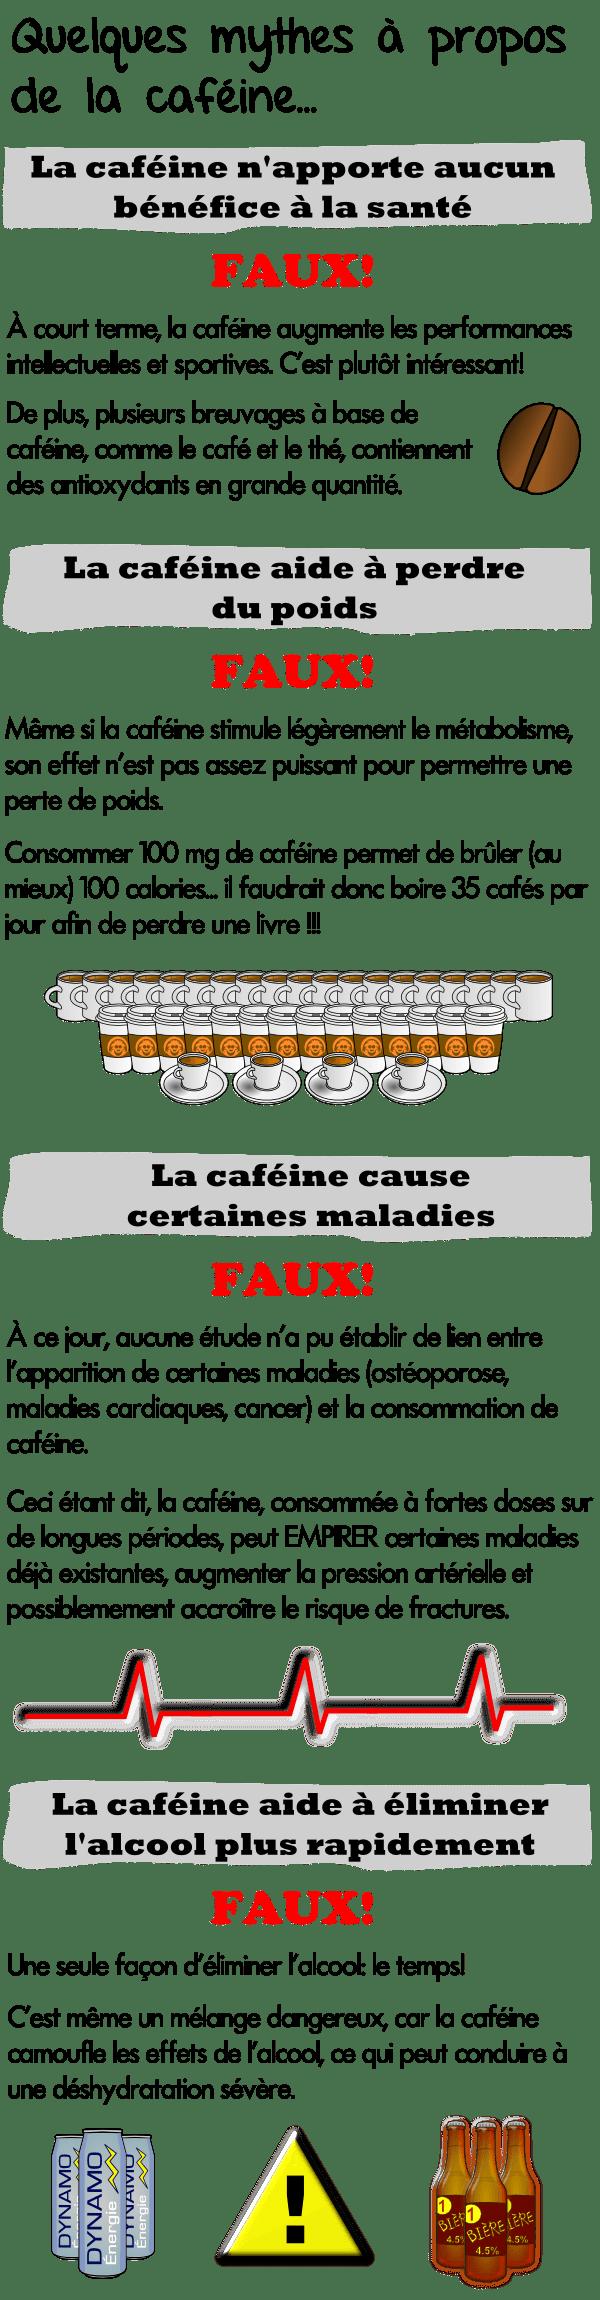 caféine et perte de poids